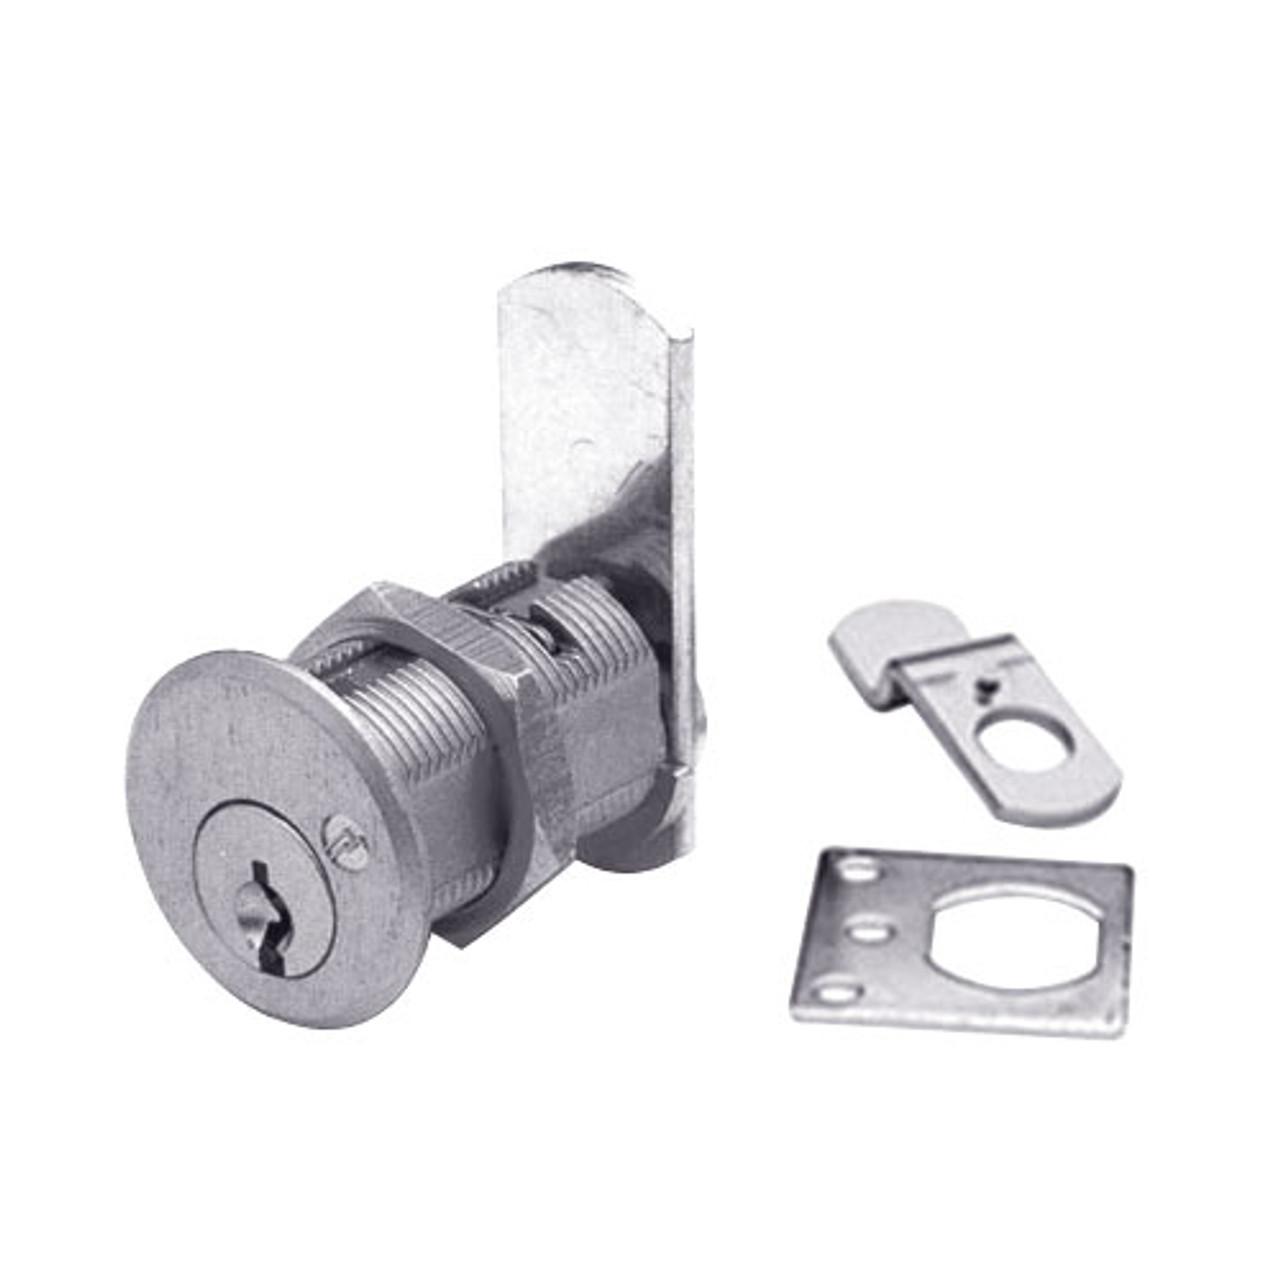 Olympus DCN3-KA103-26D Cam Locks in Satin Chrome Finish